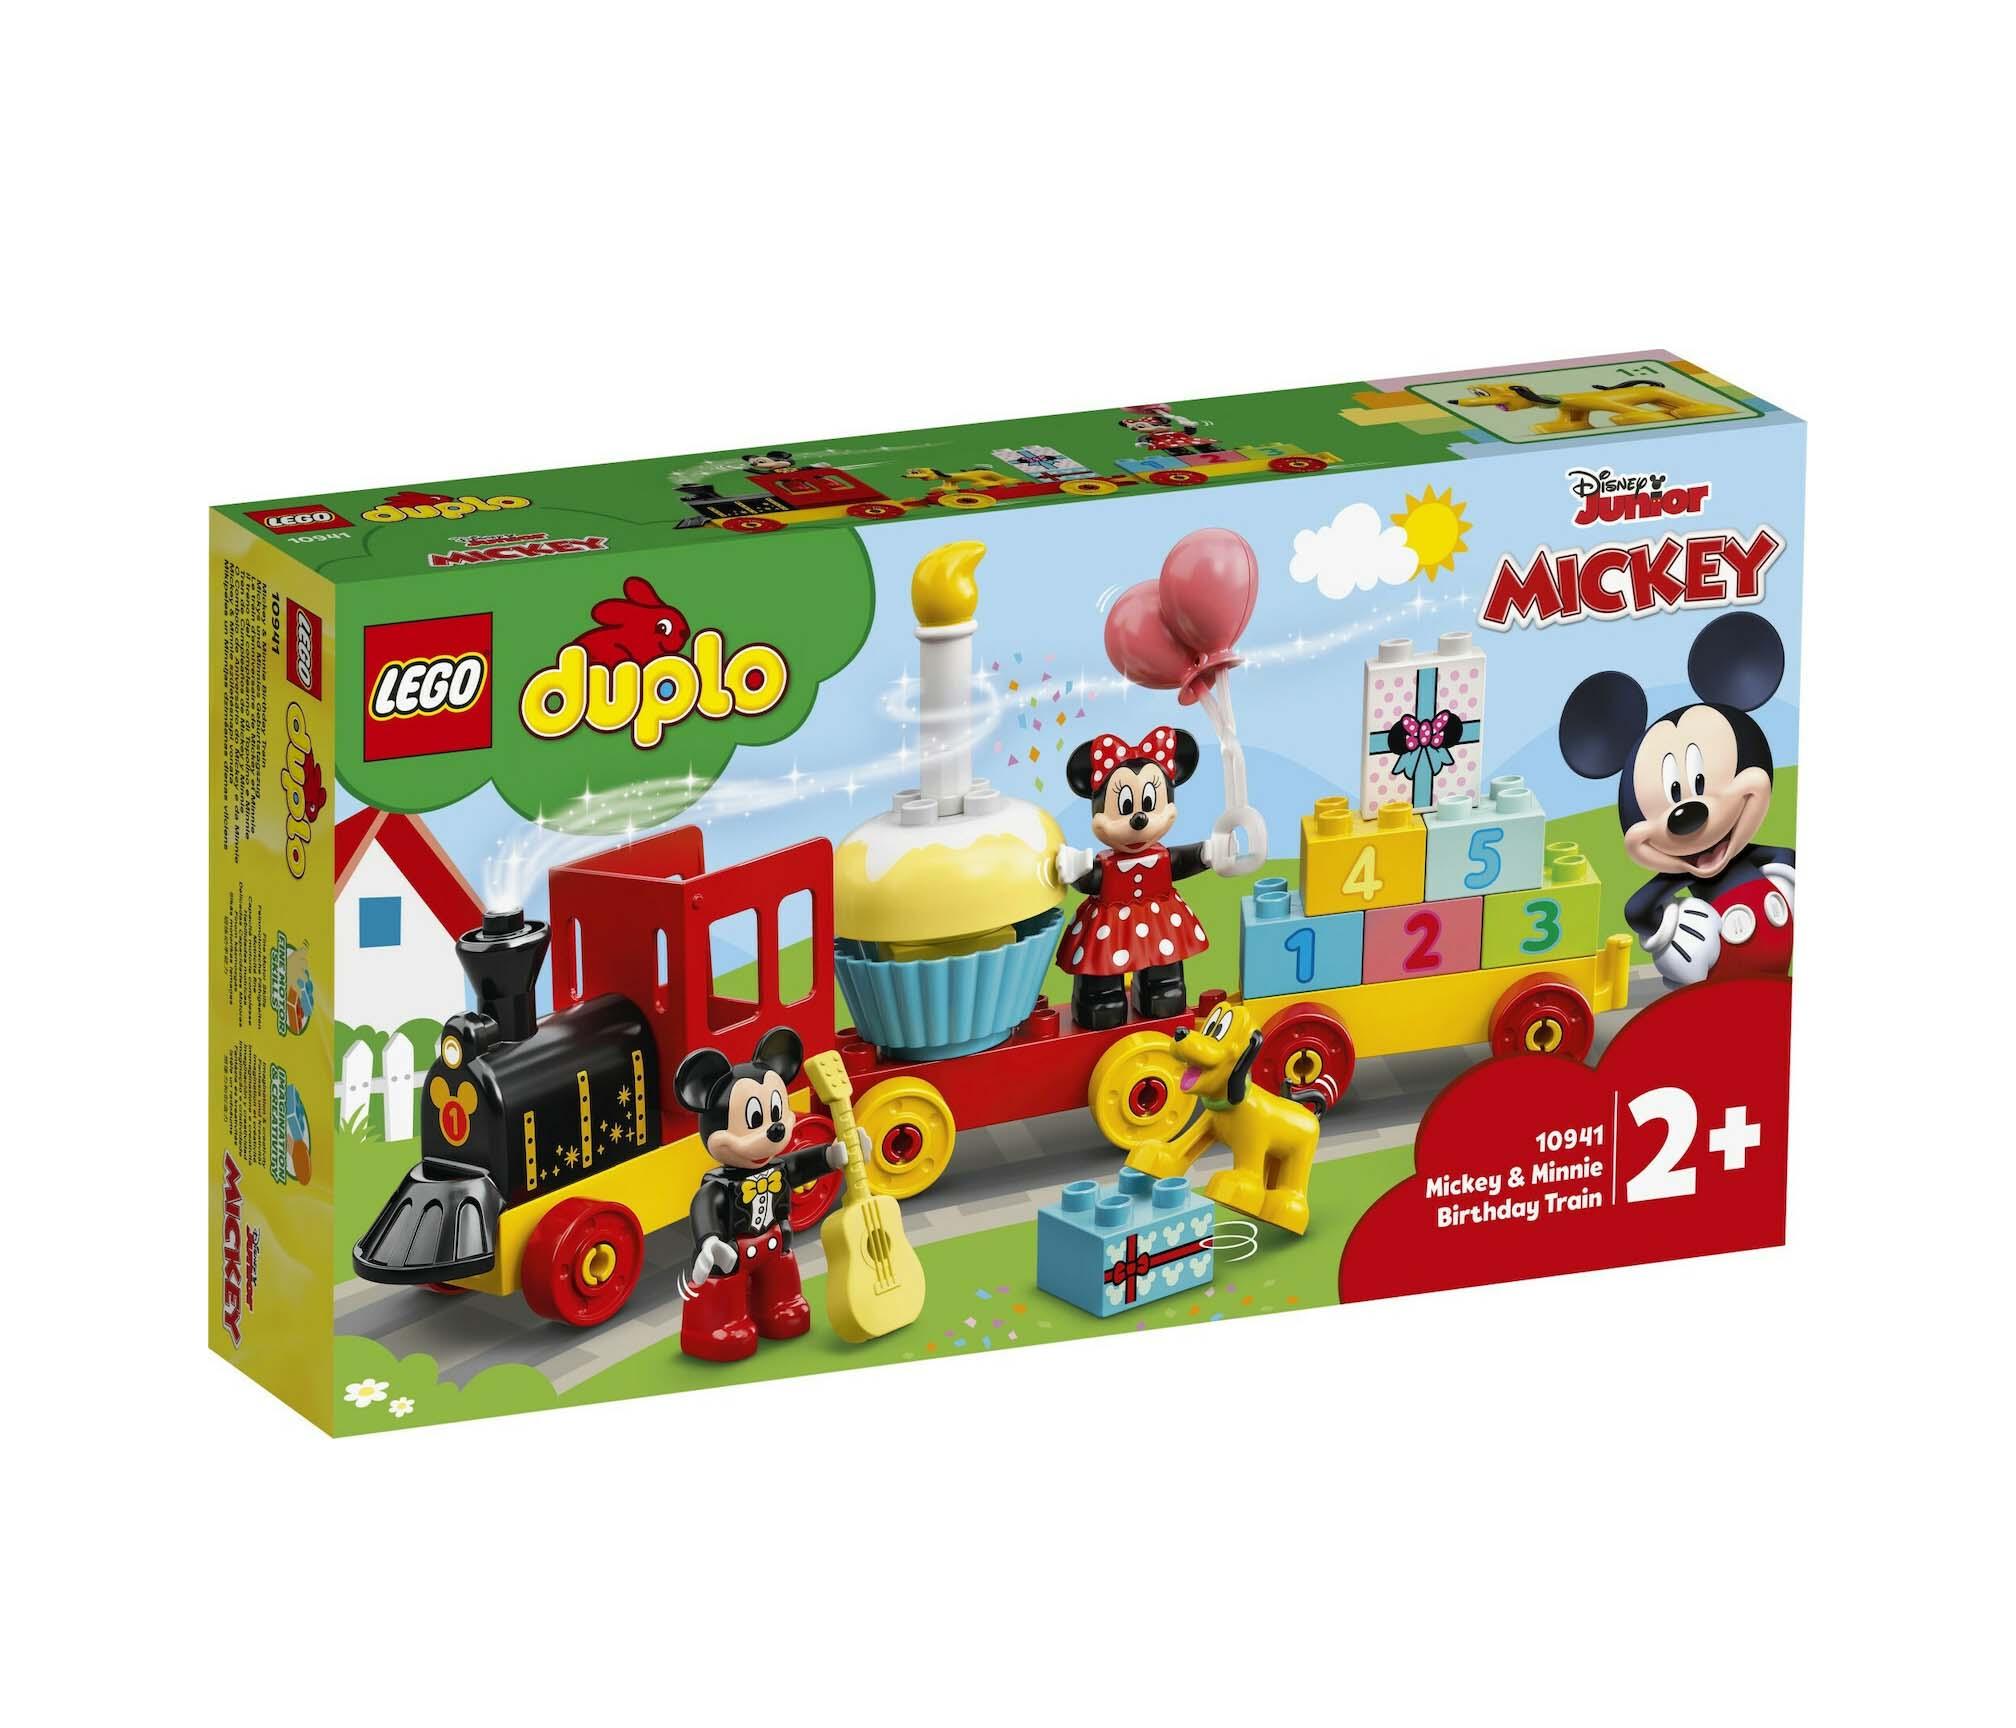 Lego Disney: Mickey And Minnie Birthday Train 10941